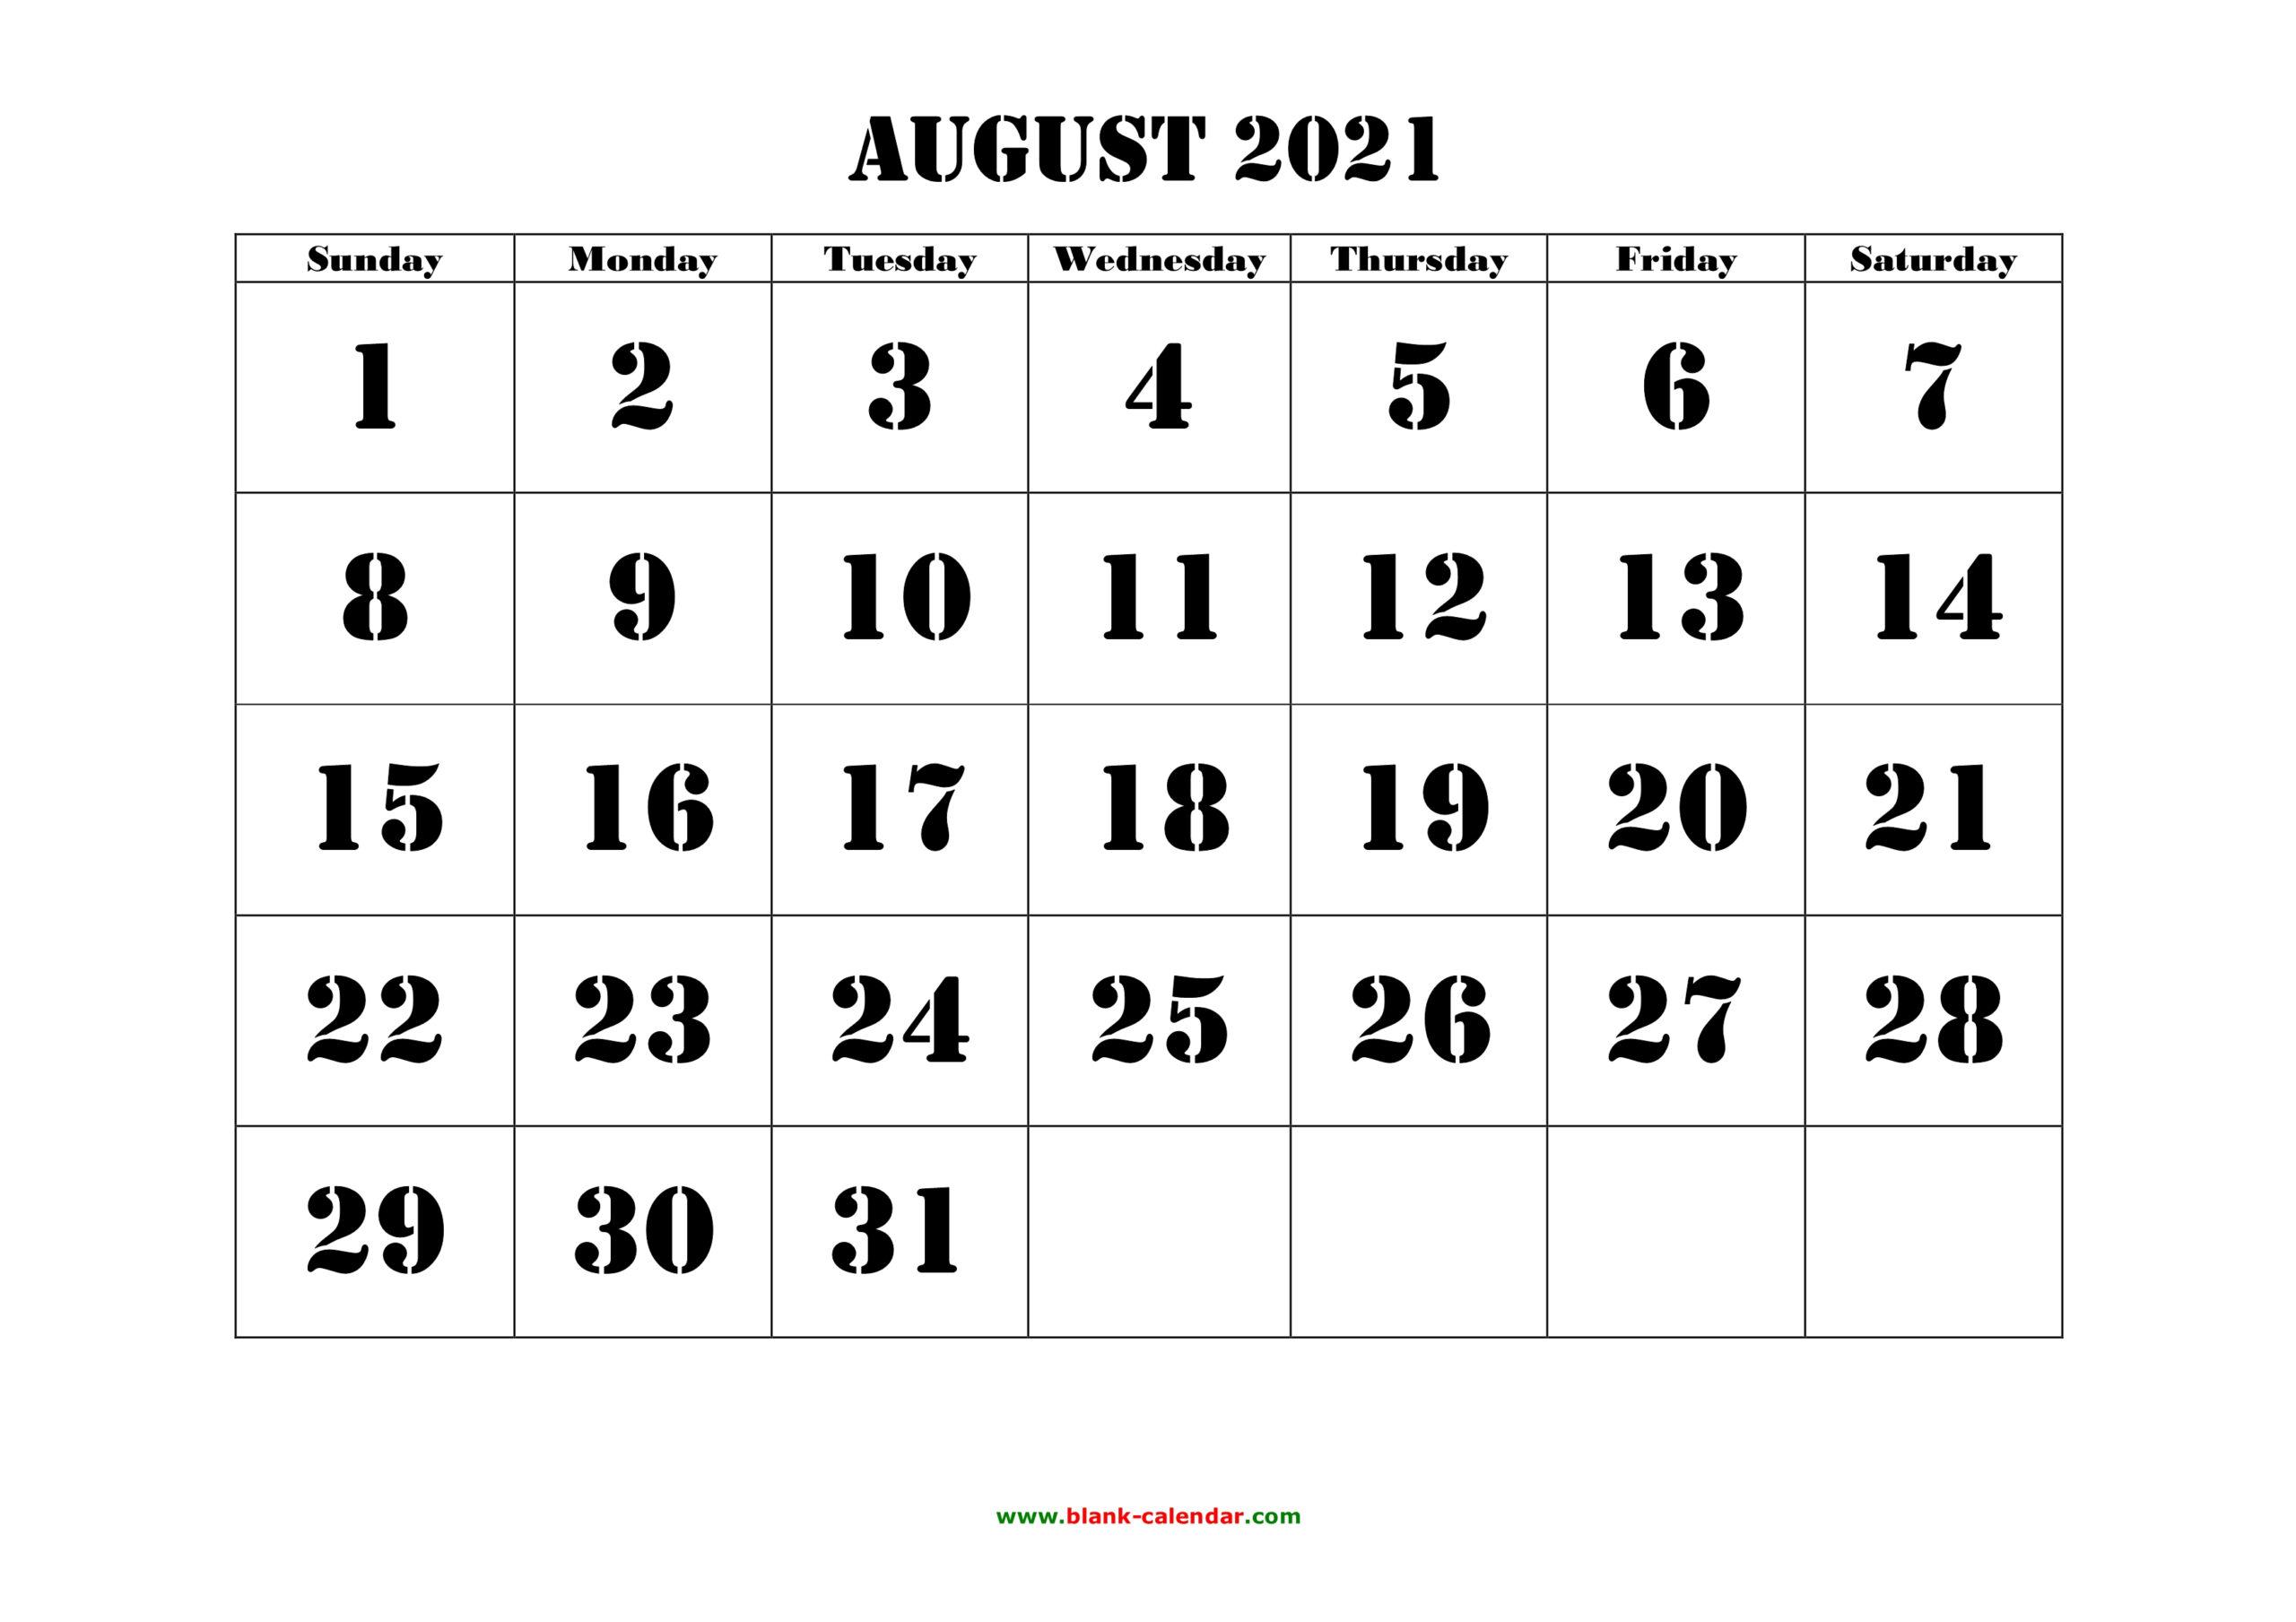 Free Download Printable August 2021 Calendar, Large Font with 2021 Large Bold Printable Calendar